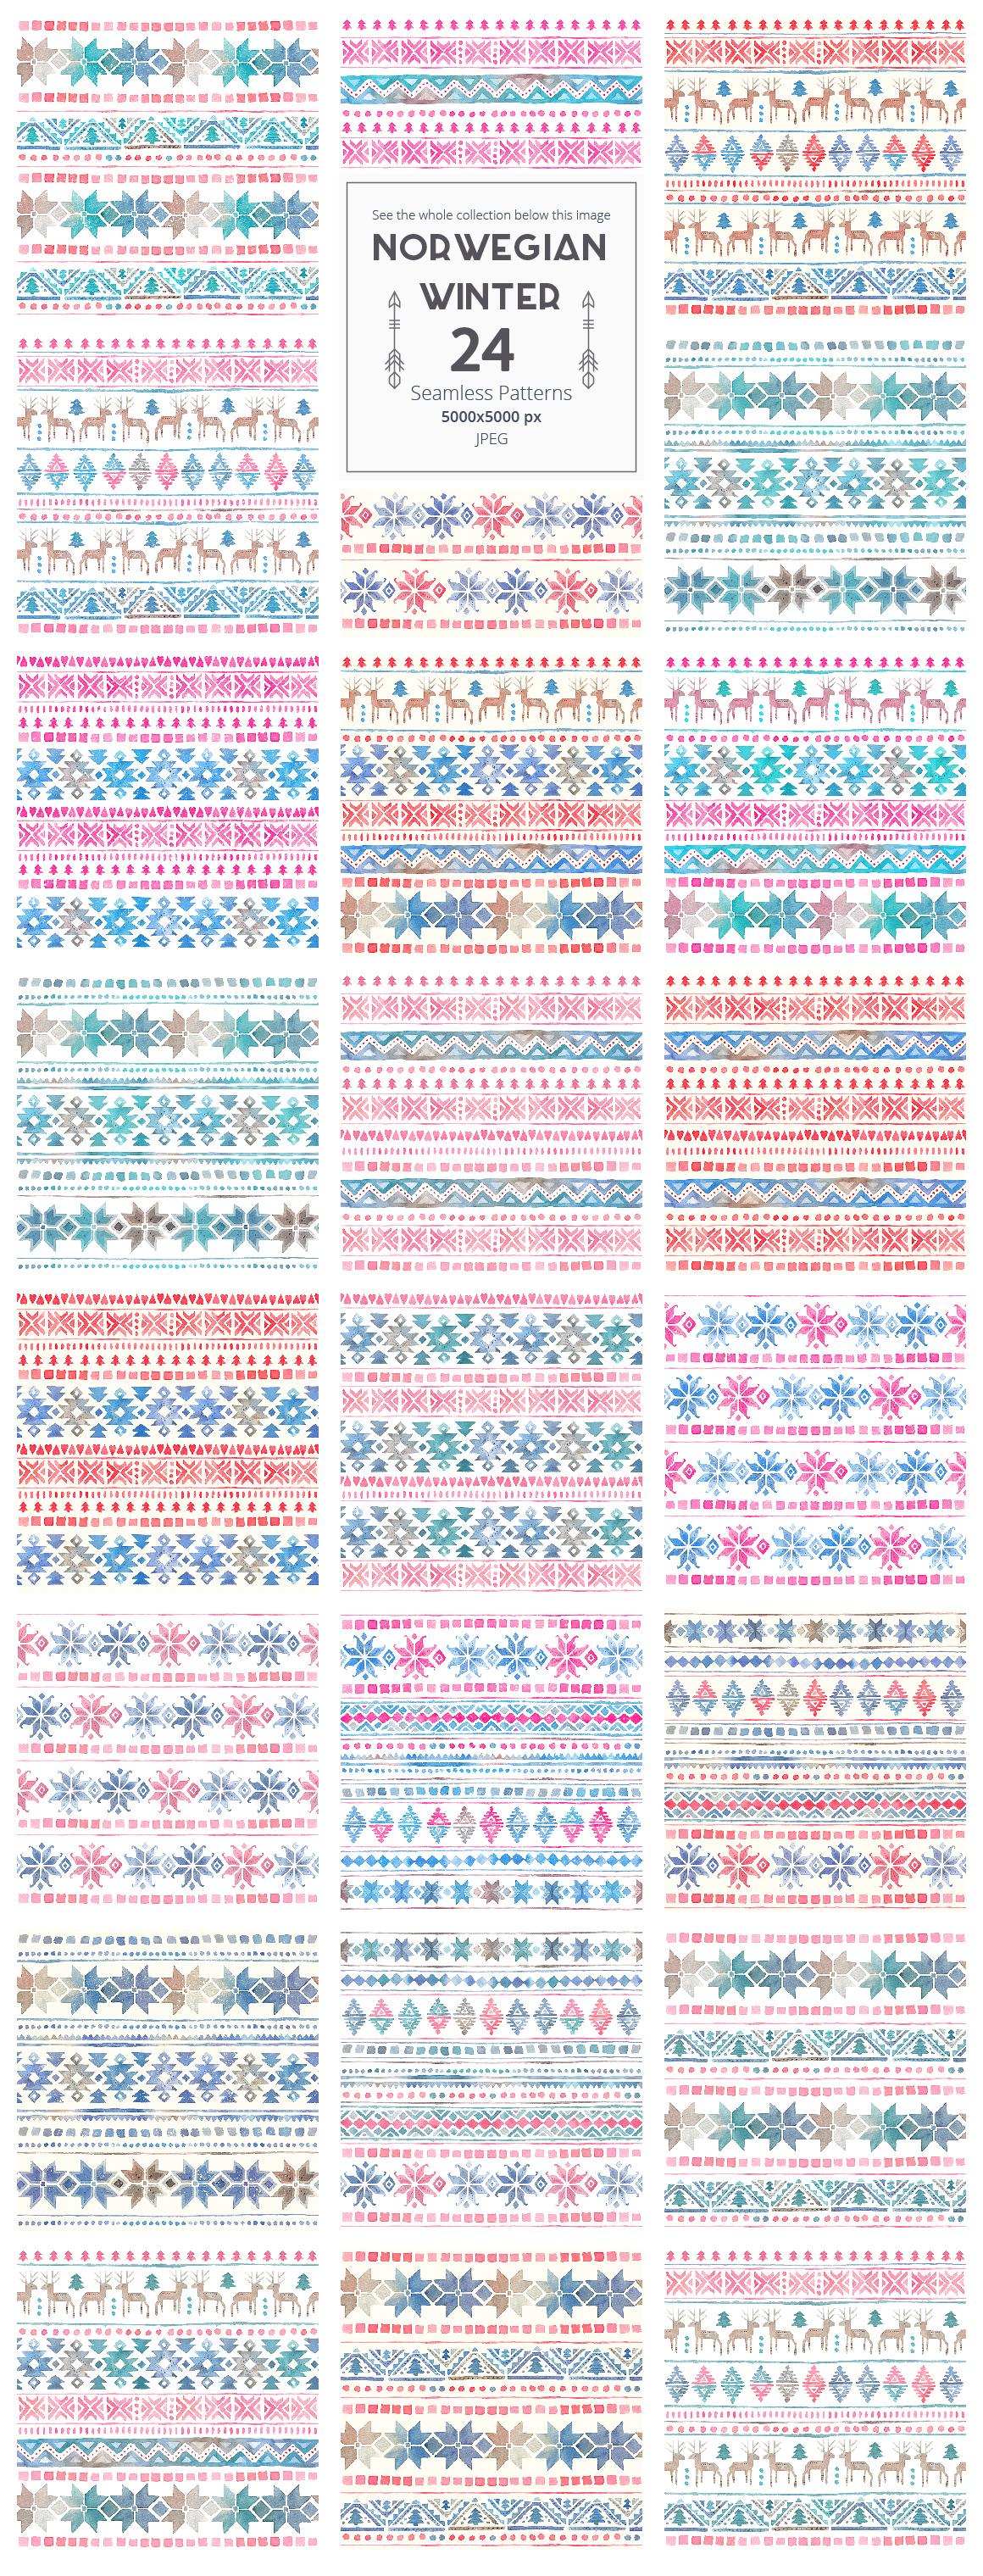 Norwegian Winter: Seamless Patterns example image 3